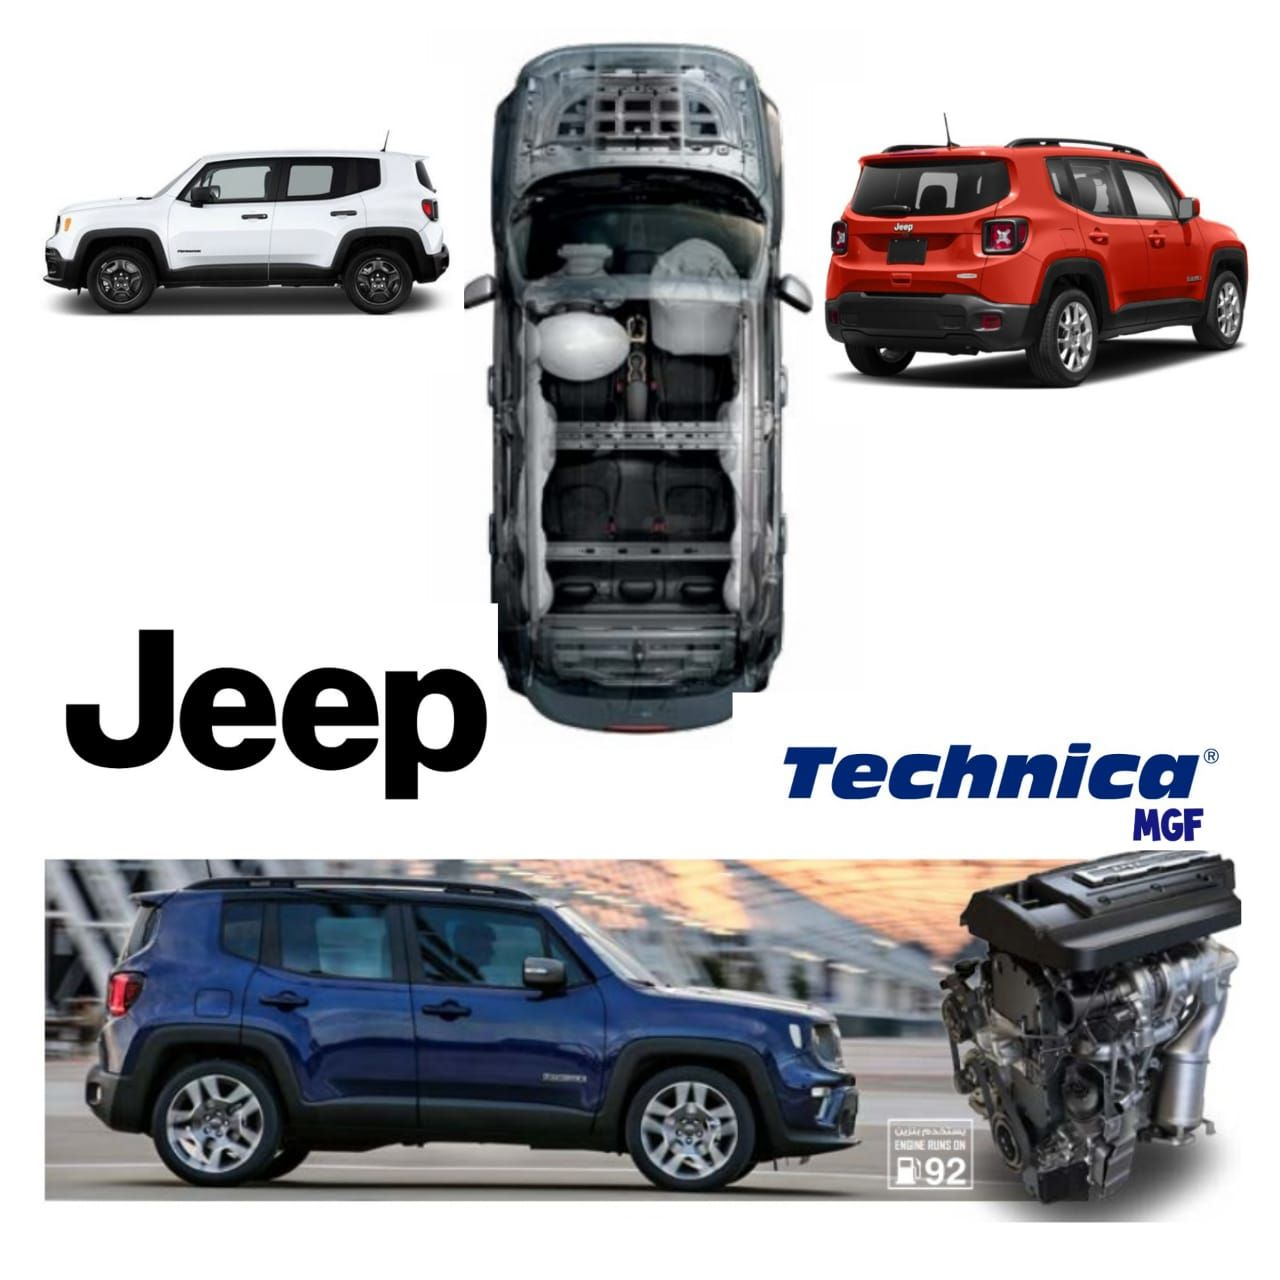 Jeep Renegade 2020 Jeep Renegade Jeep Car